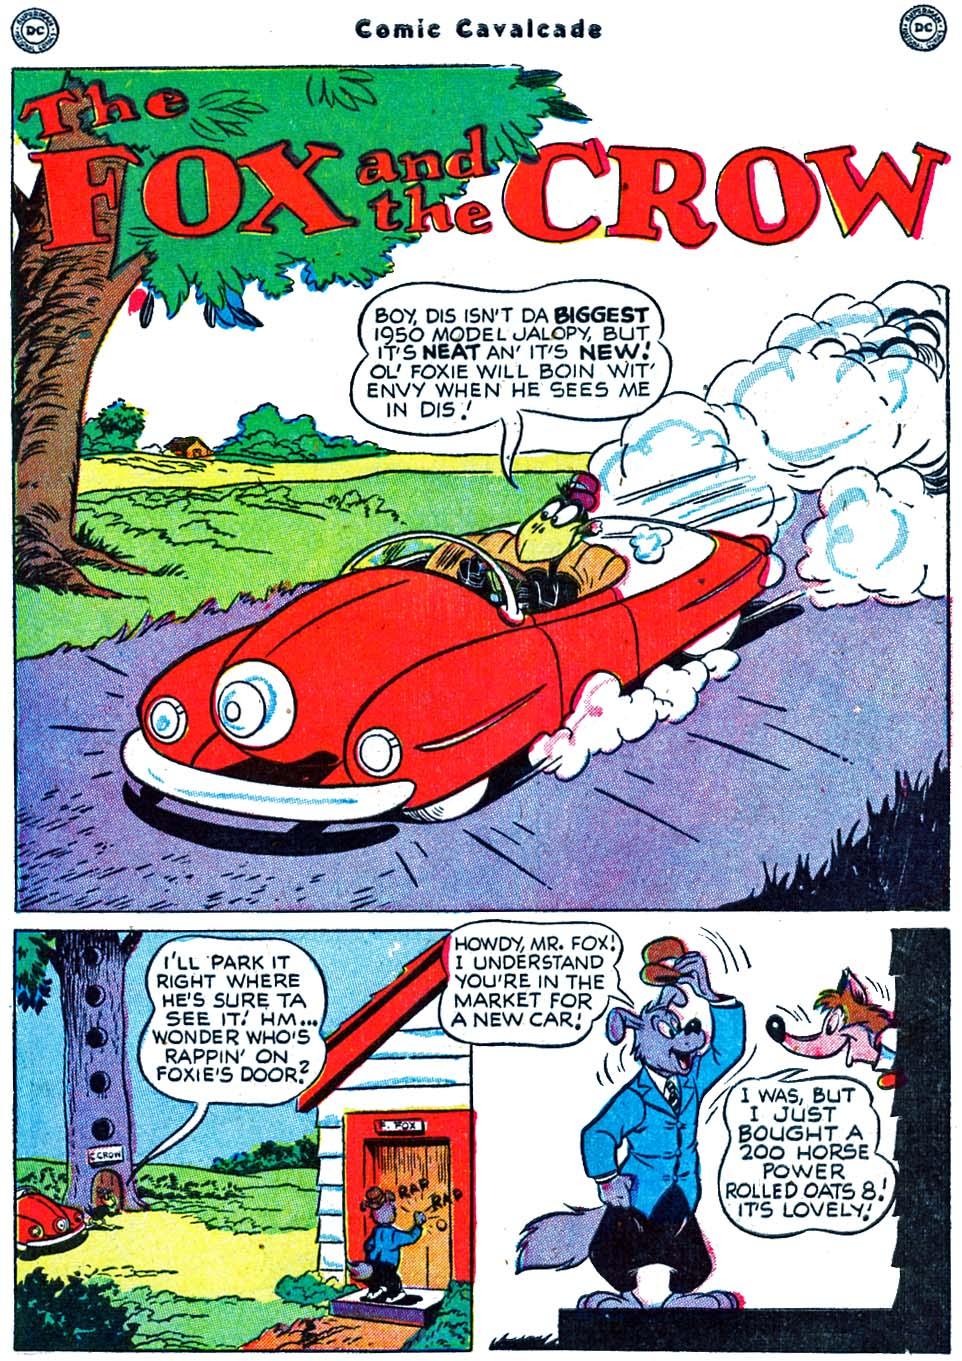 Comic Cavalcade issue 39 - Page 3